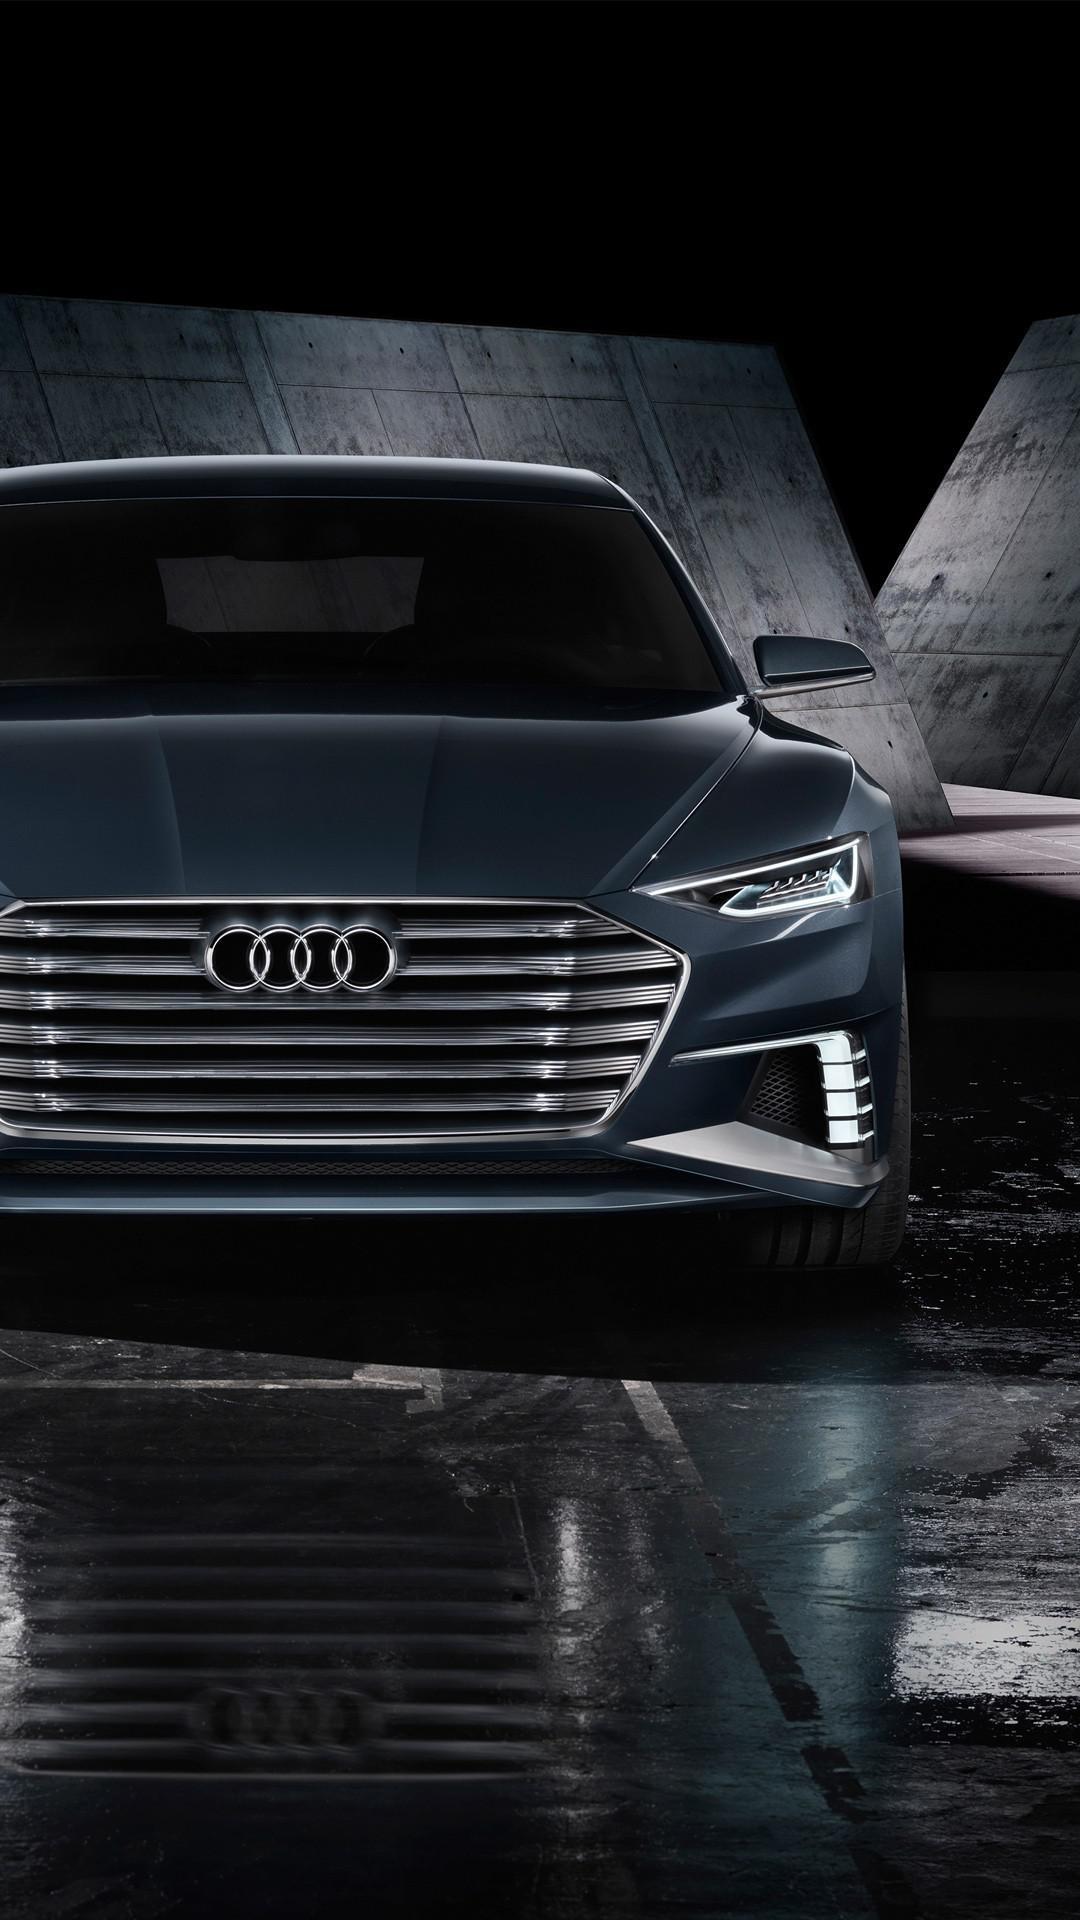 Audi R8 Hd Widescreen Wallpapers 1080p Die 77 Besten Audi Hintergrundbilder